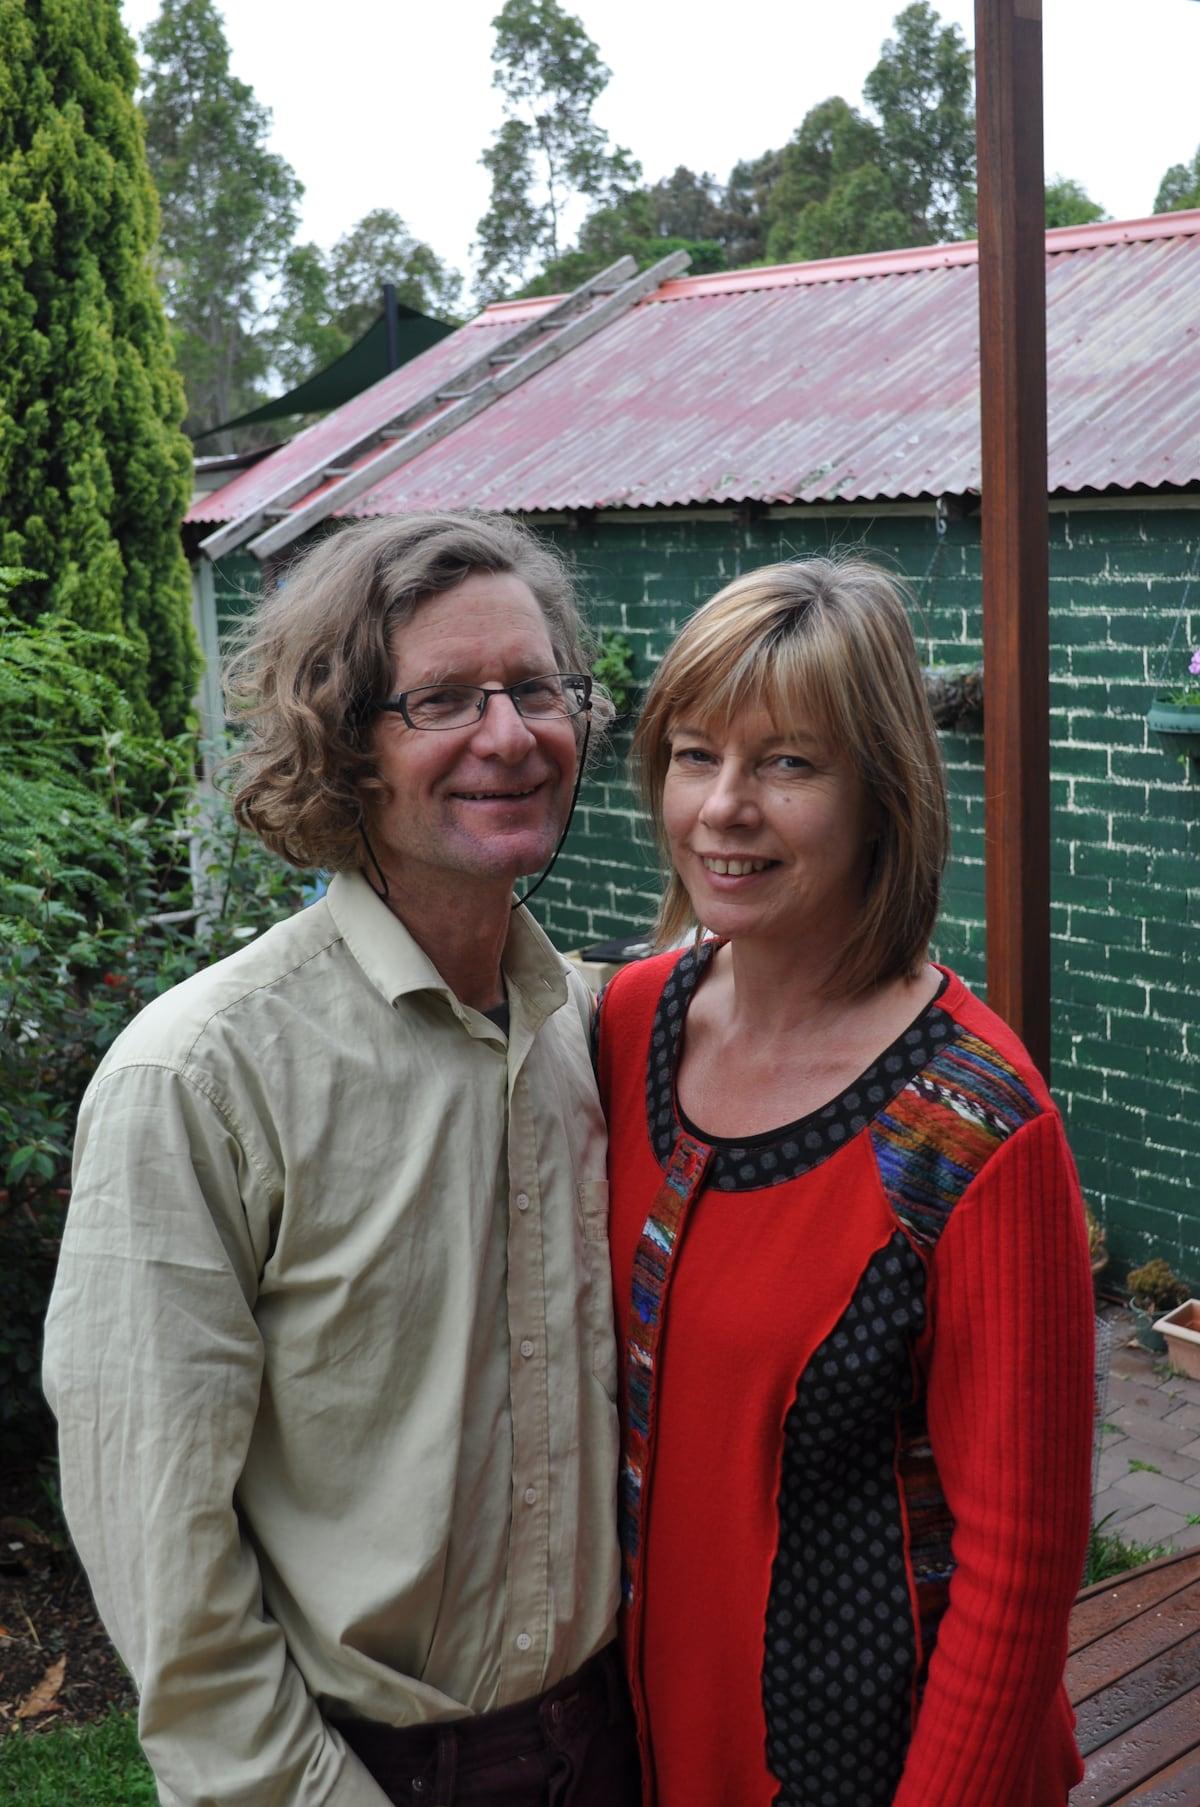 David From Earlwood, Australia